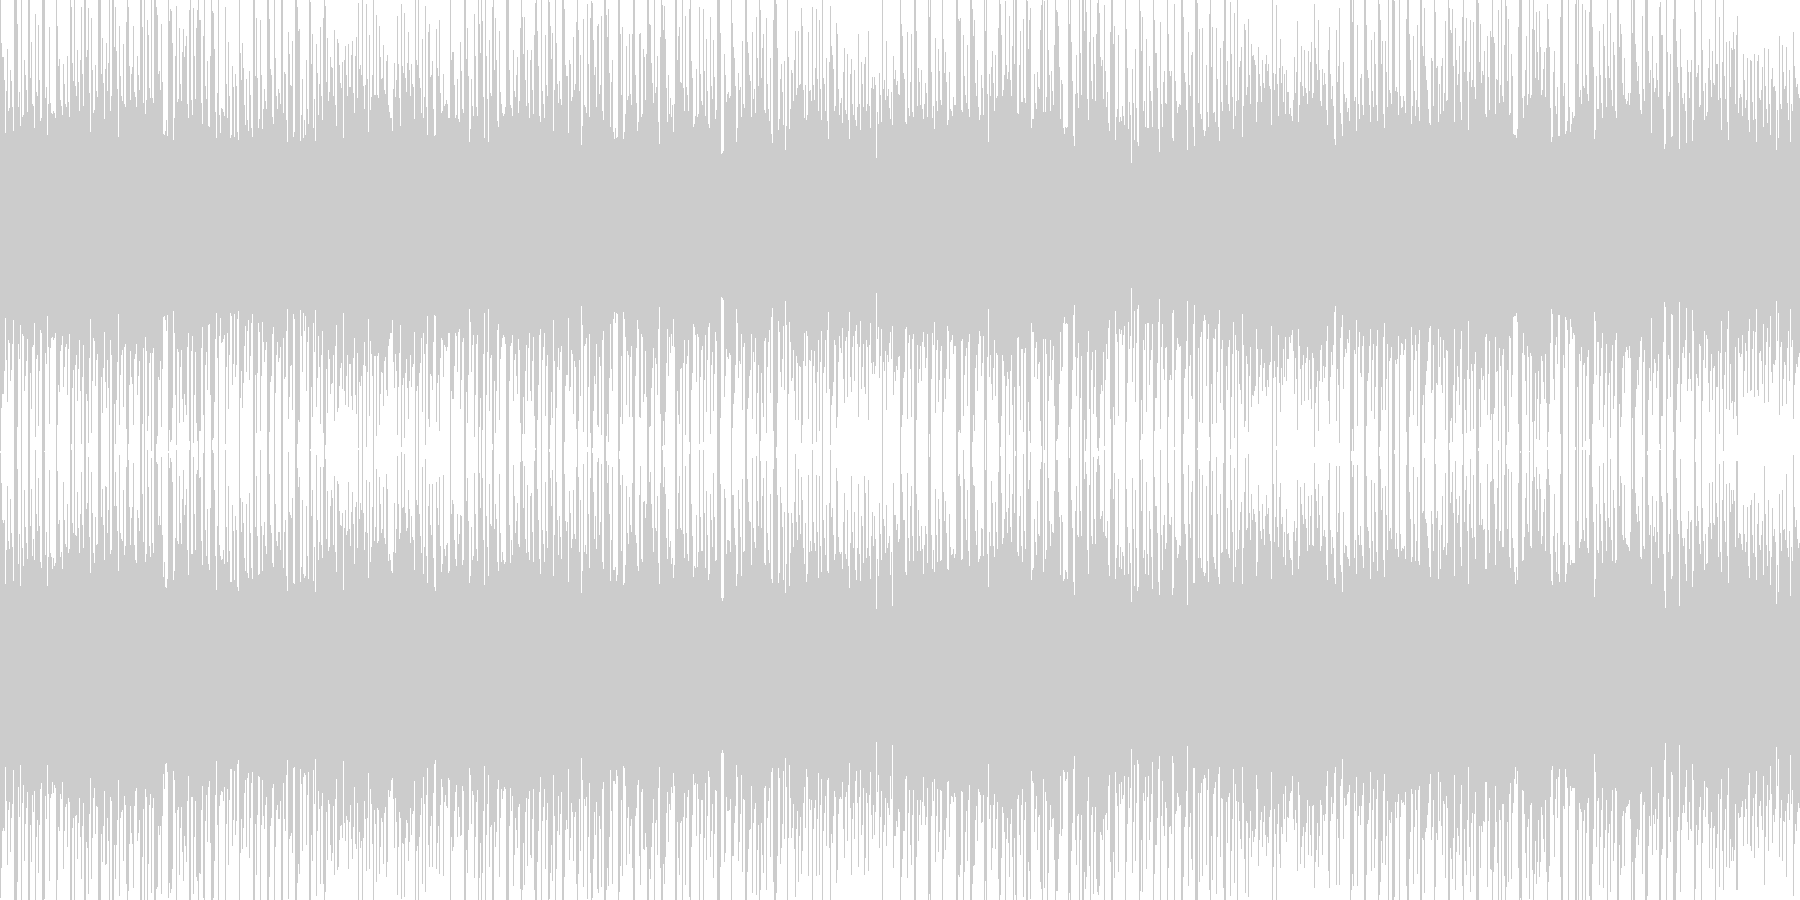 EDM風なお祭りの音楽 1分ぴったり の未再生の波形